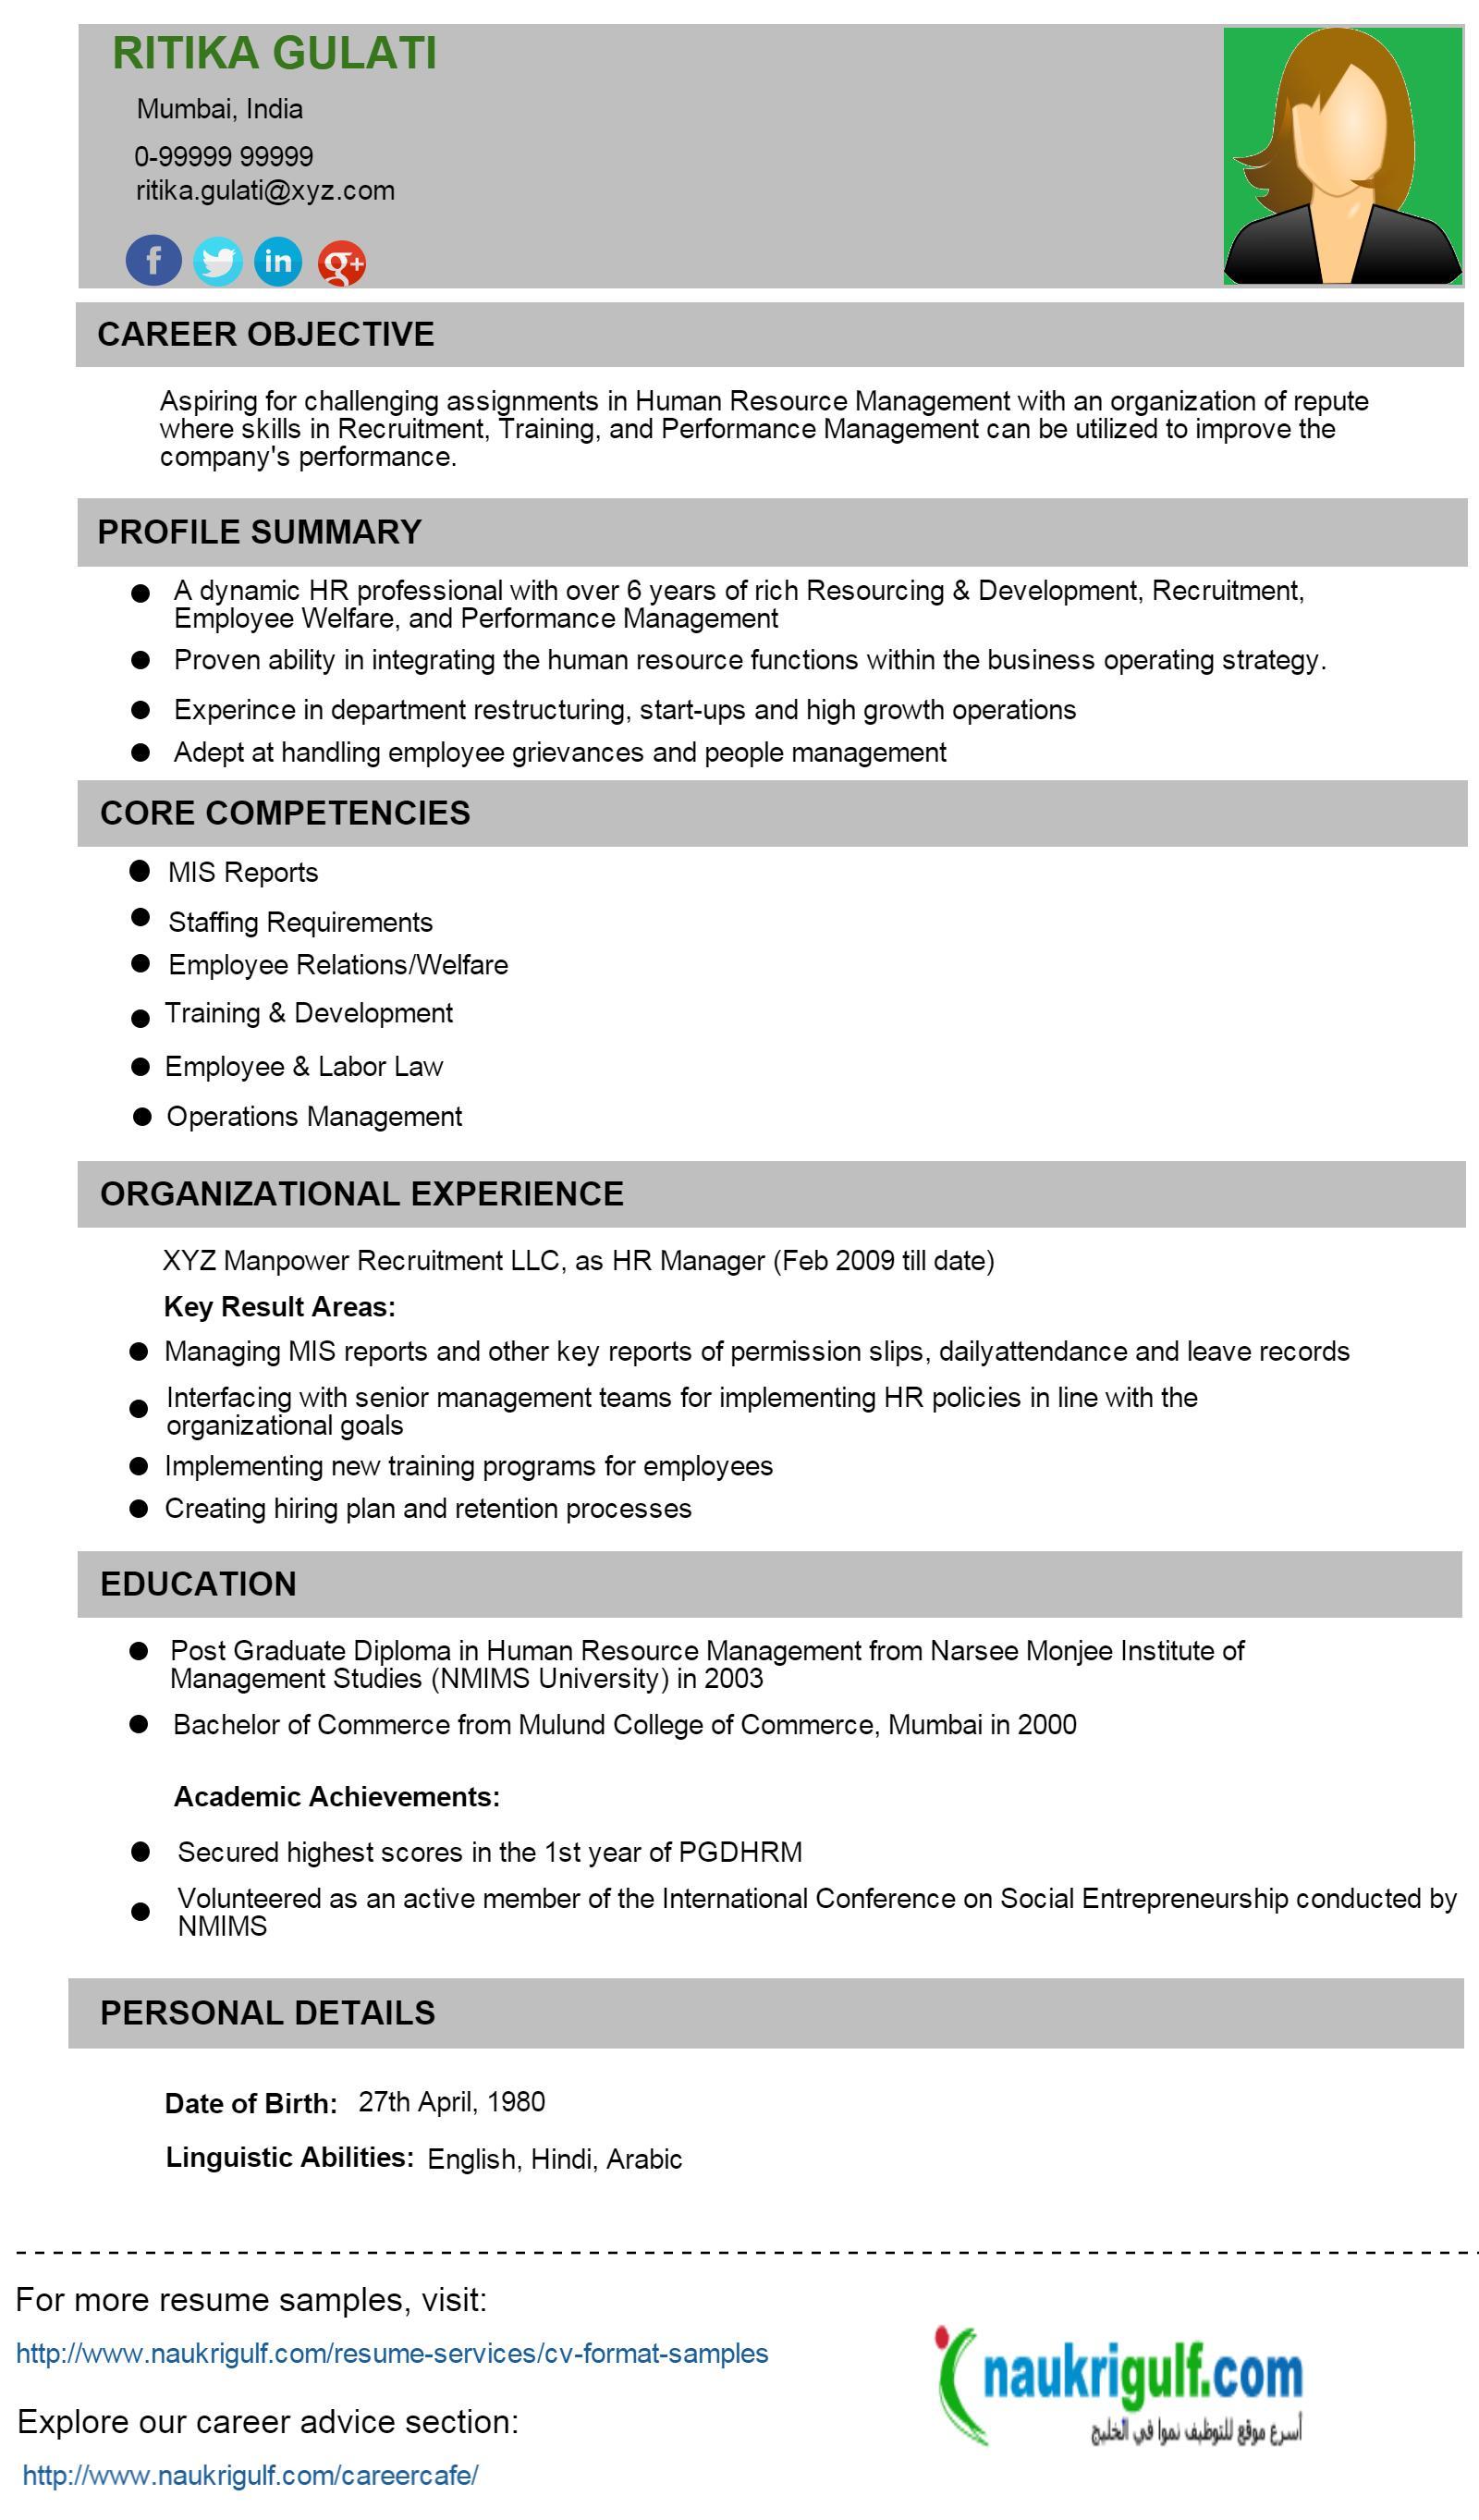 Human Resources Job Description For Resume Cover Letter